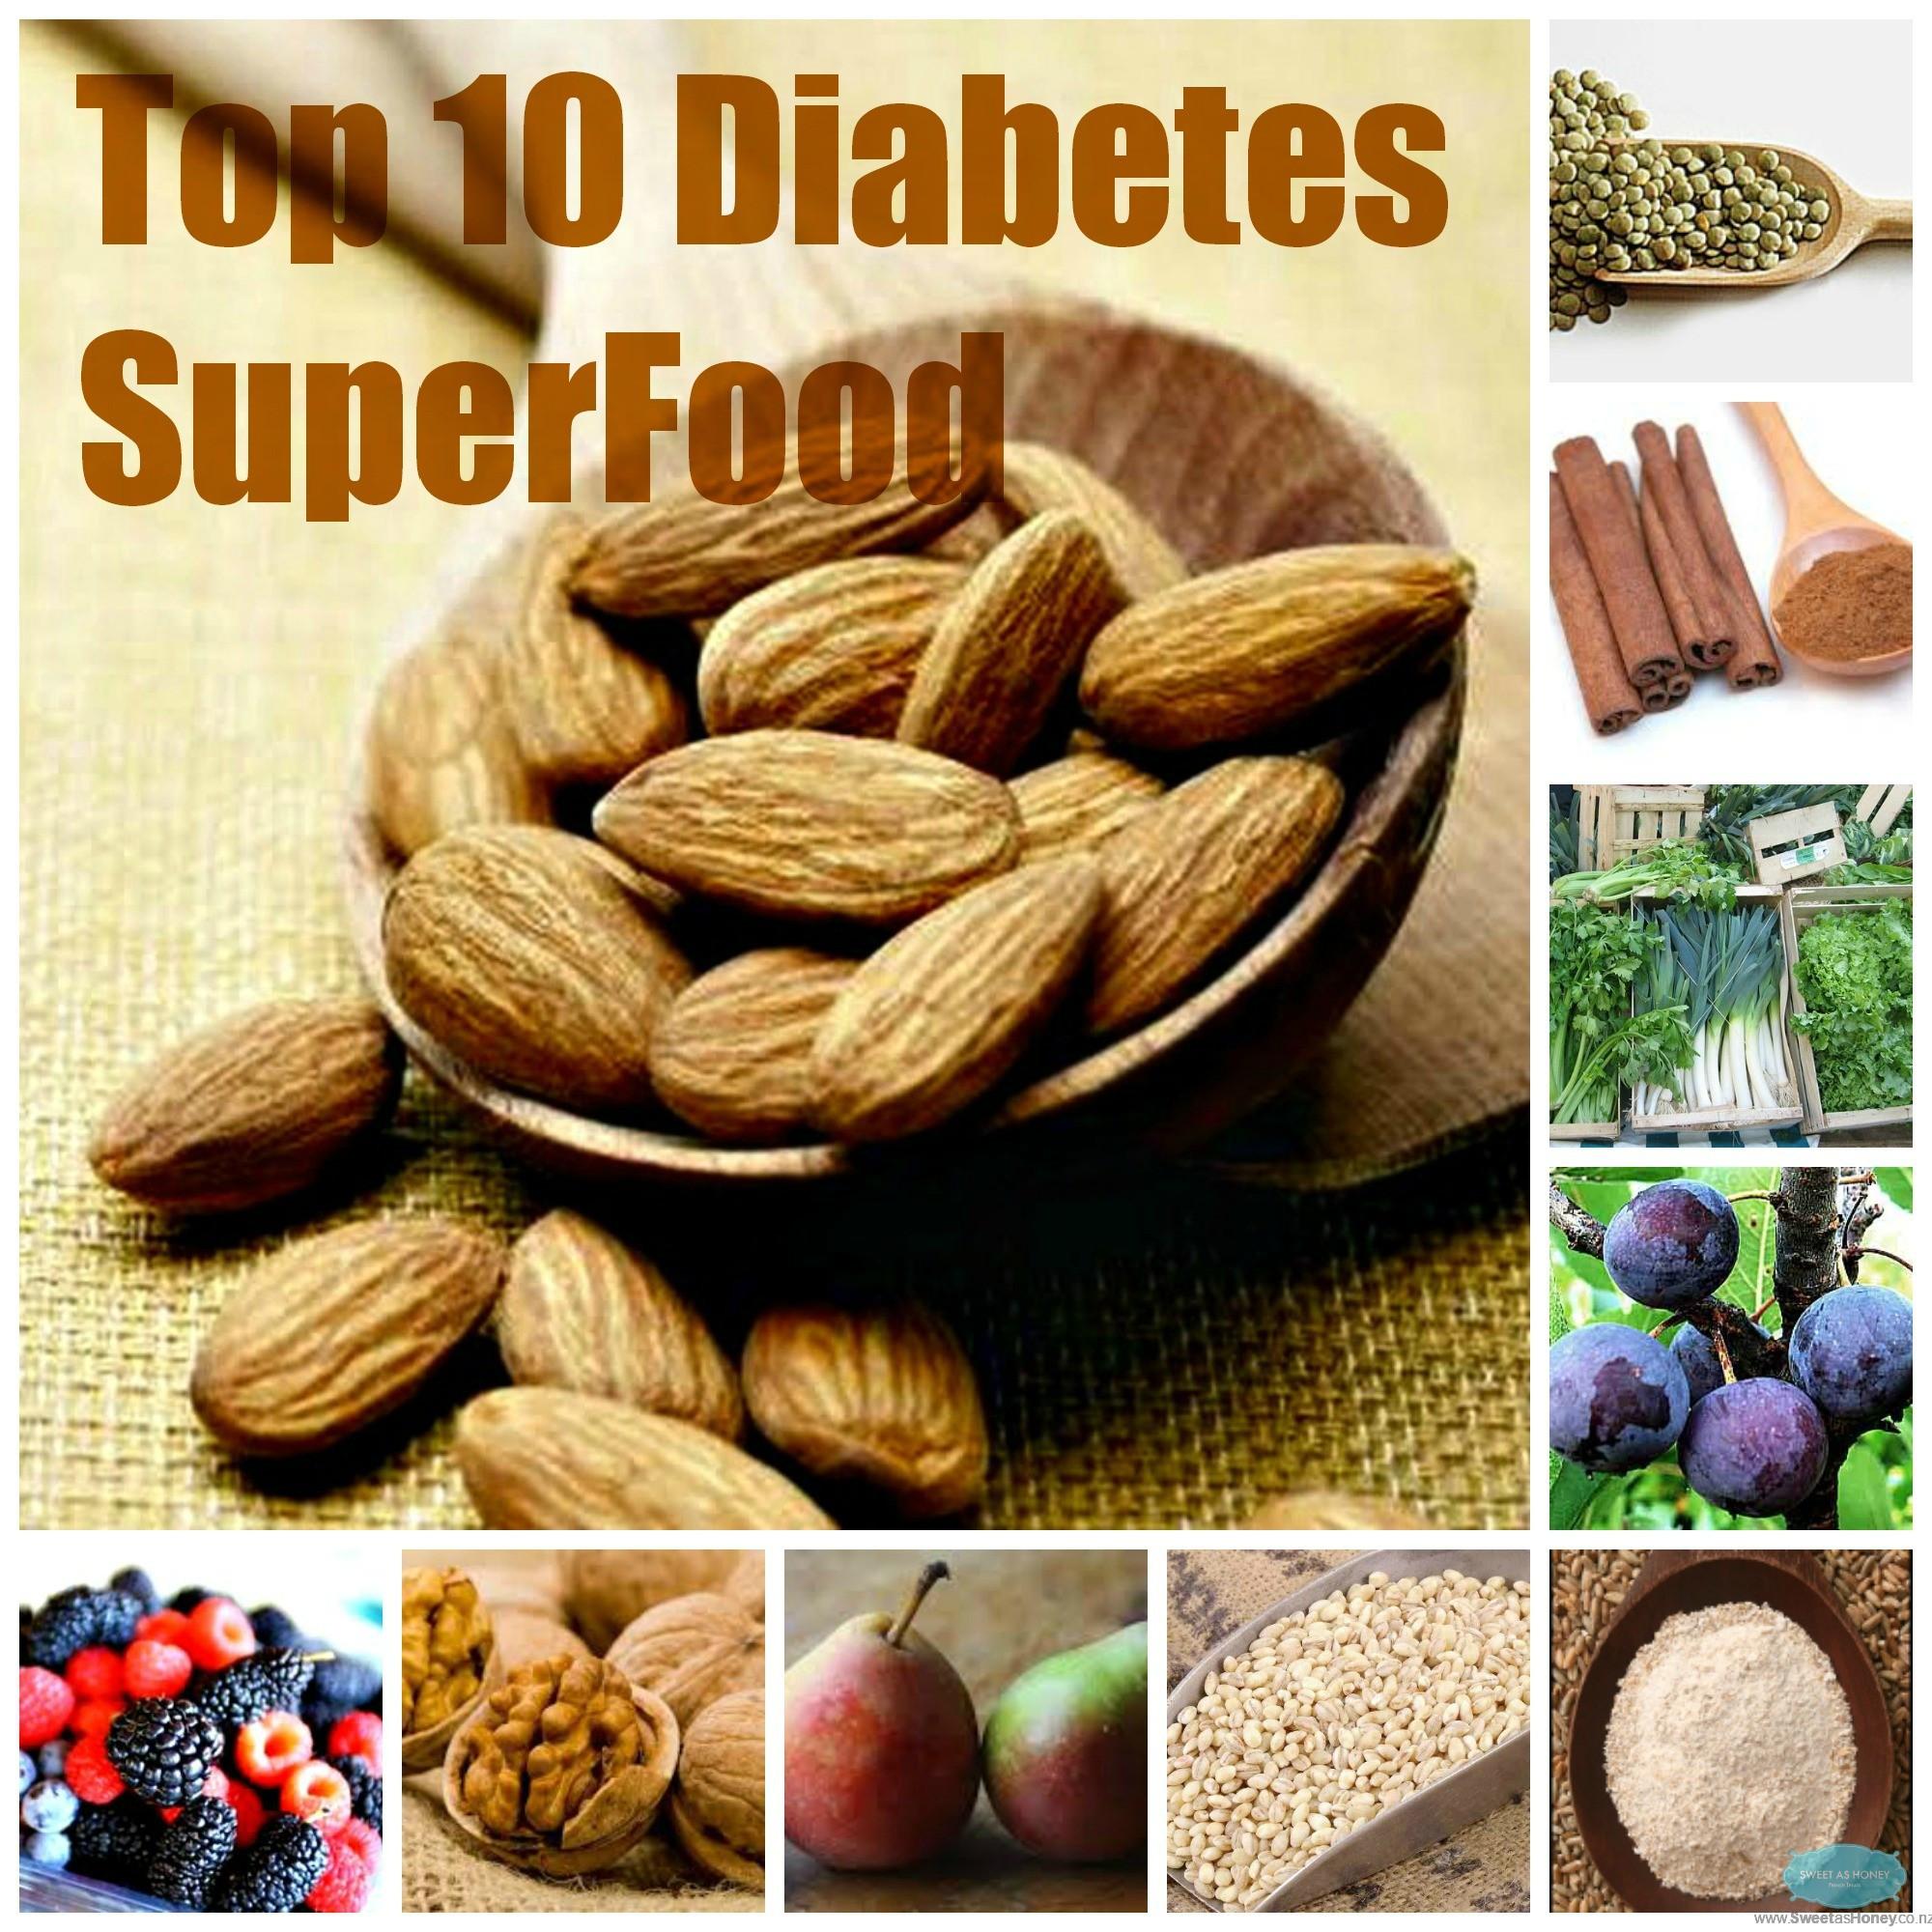 Diabetic Foods Recipes  what fruits should diabetics not eat